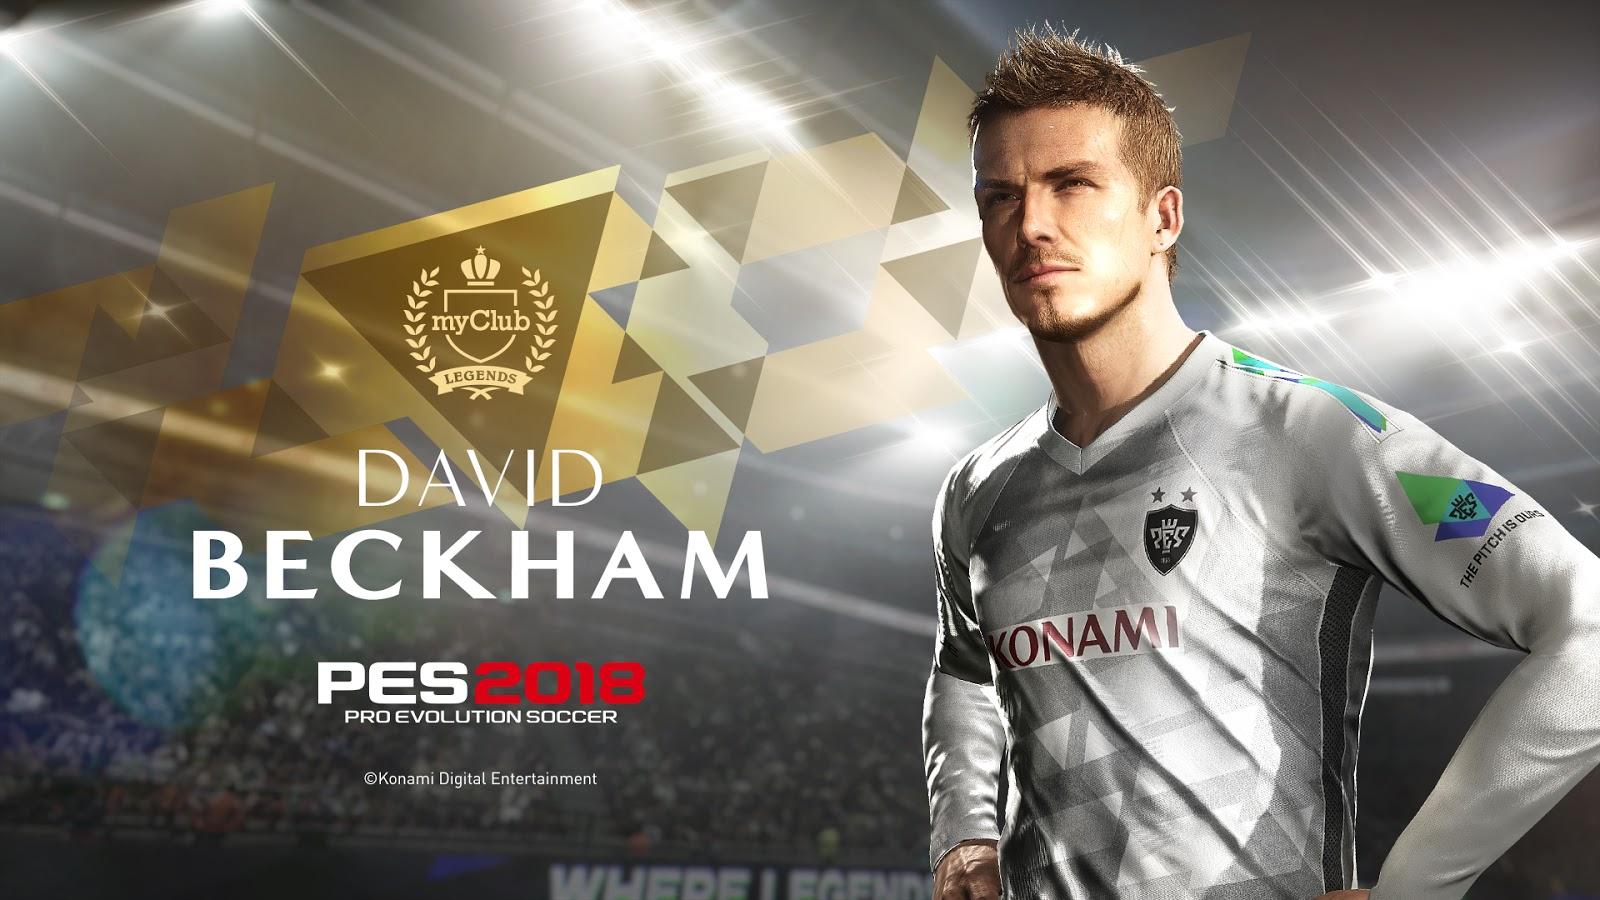 David Beckham aparecerá como leyenda en PES 2018